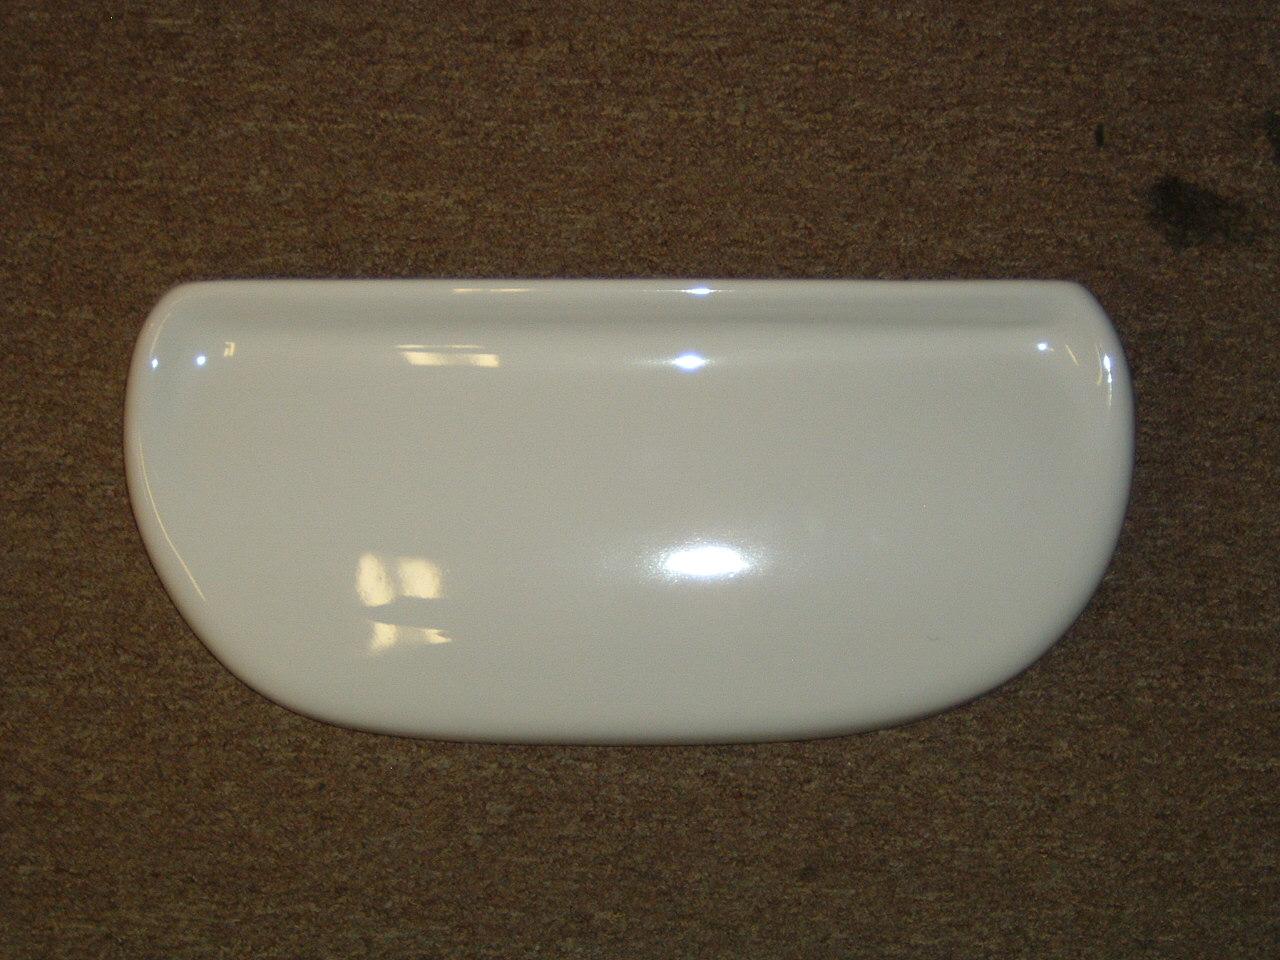 American Standard White Tank Lid 735083 400 020 Fits 4098